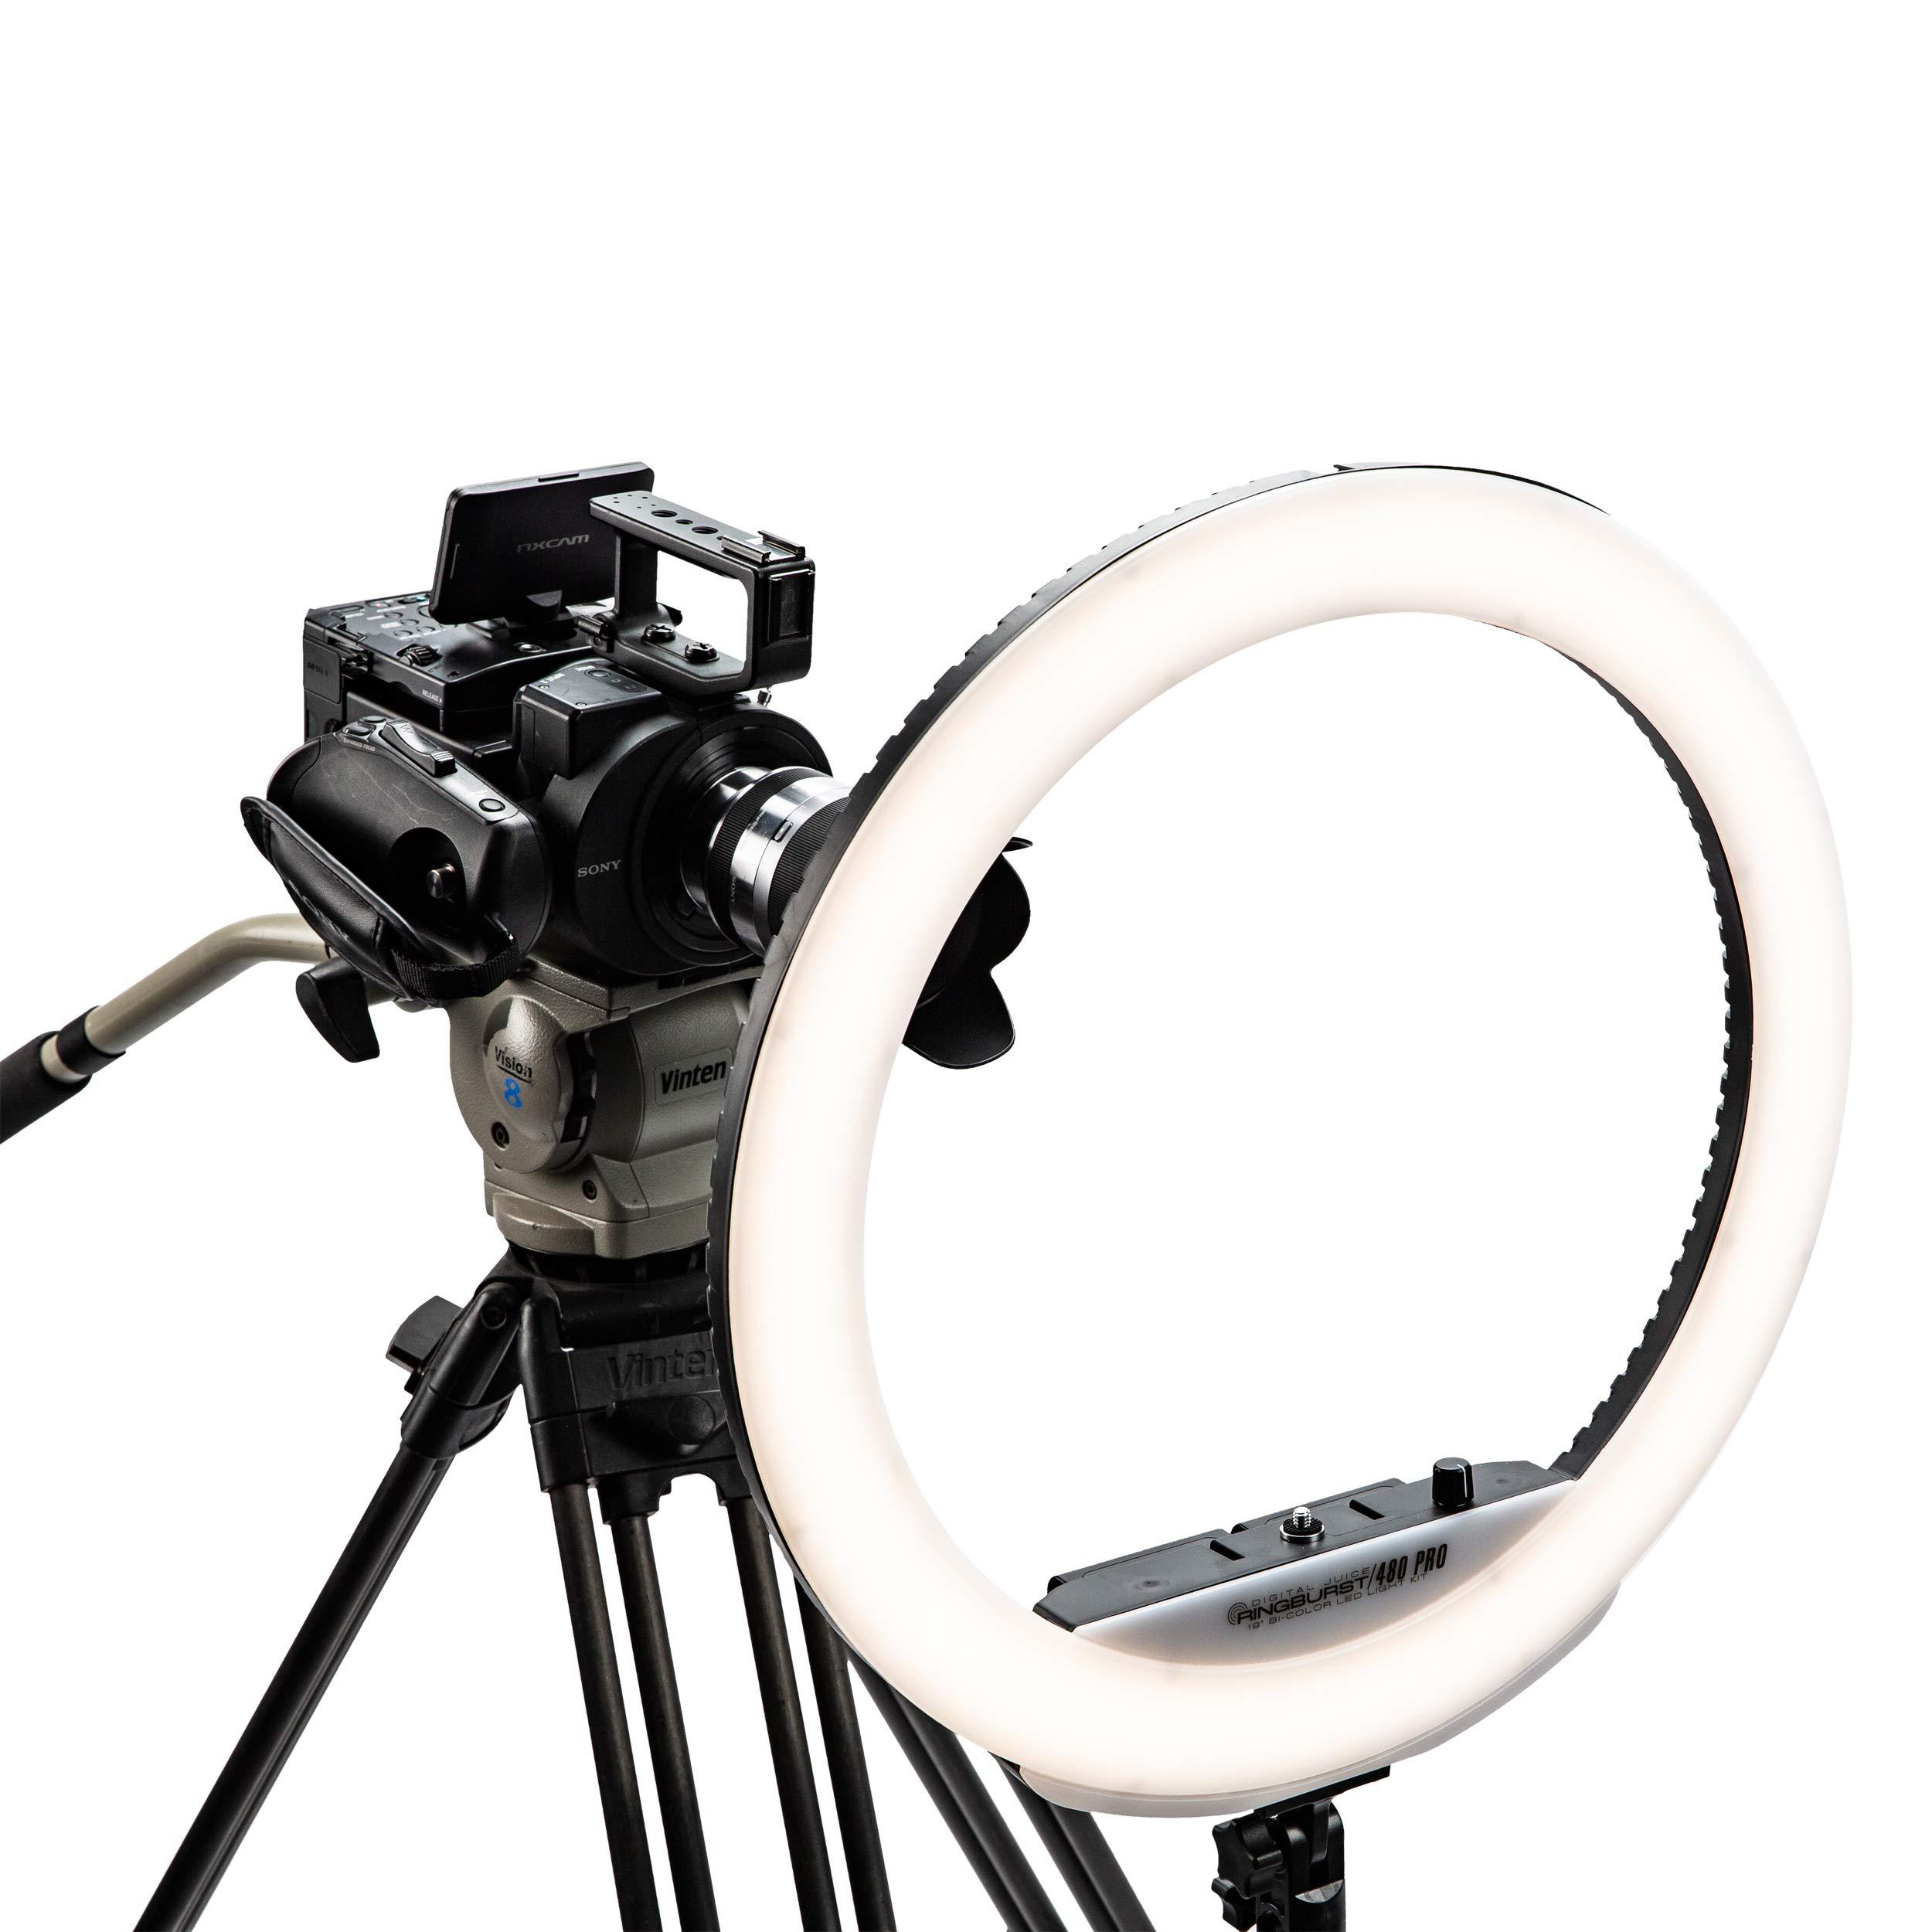 Digital Juice RingBurst 480 PRO - Affordable Bi-Color LED Ring Light: 19 Inch, 55W, 5600K Color Temperature, Dimmable Photo Studio Lighting Kit for Makeup Tutorials, YouTube, Vimeo, Vine Shooting